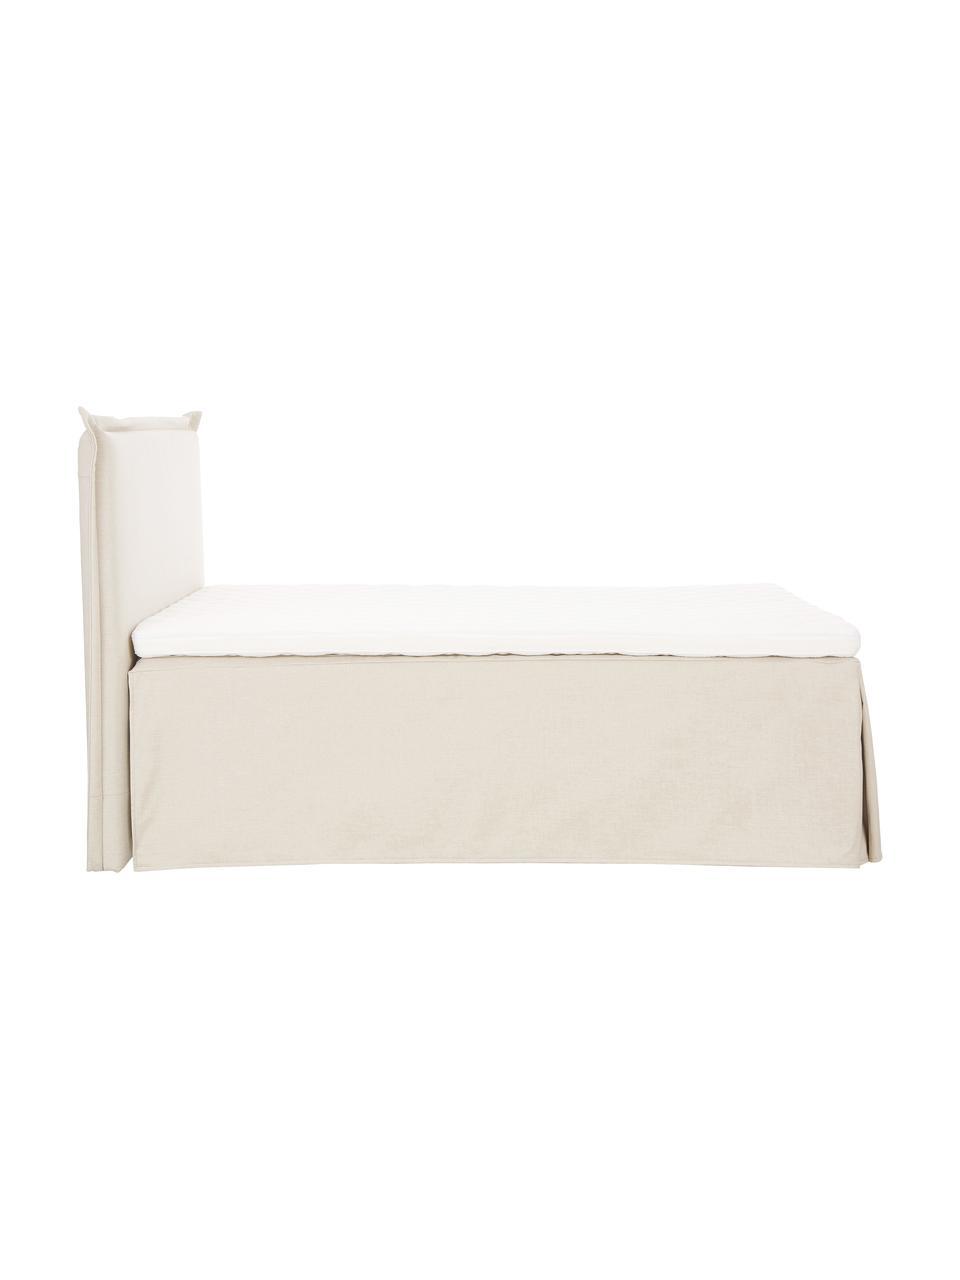 Lit à sommier tapissier Premium Violet, Tissu beige